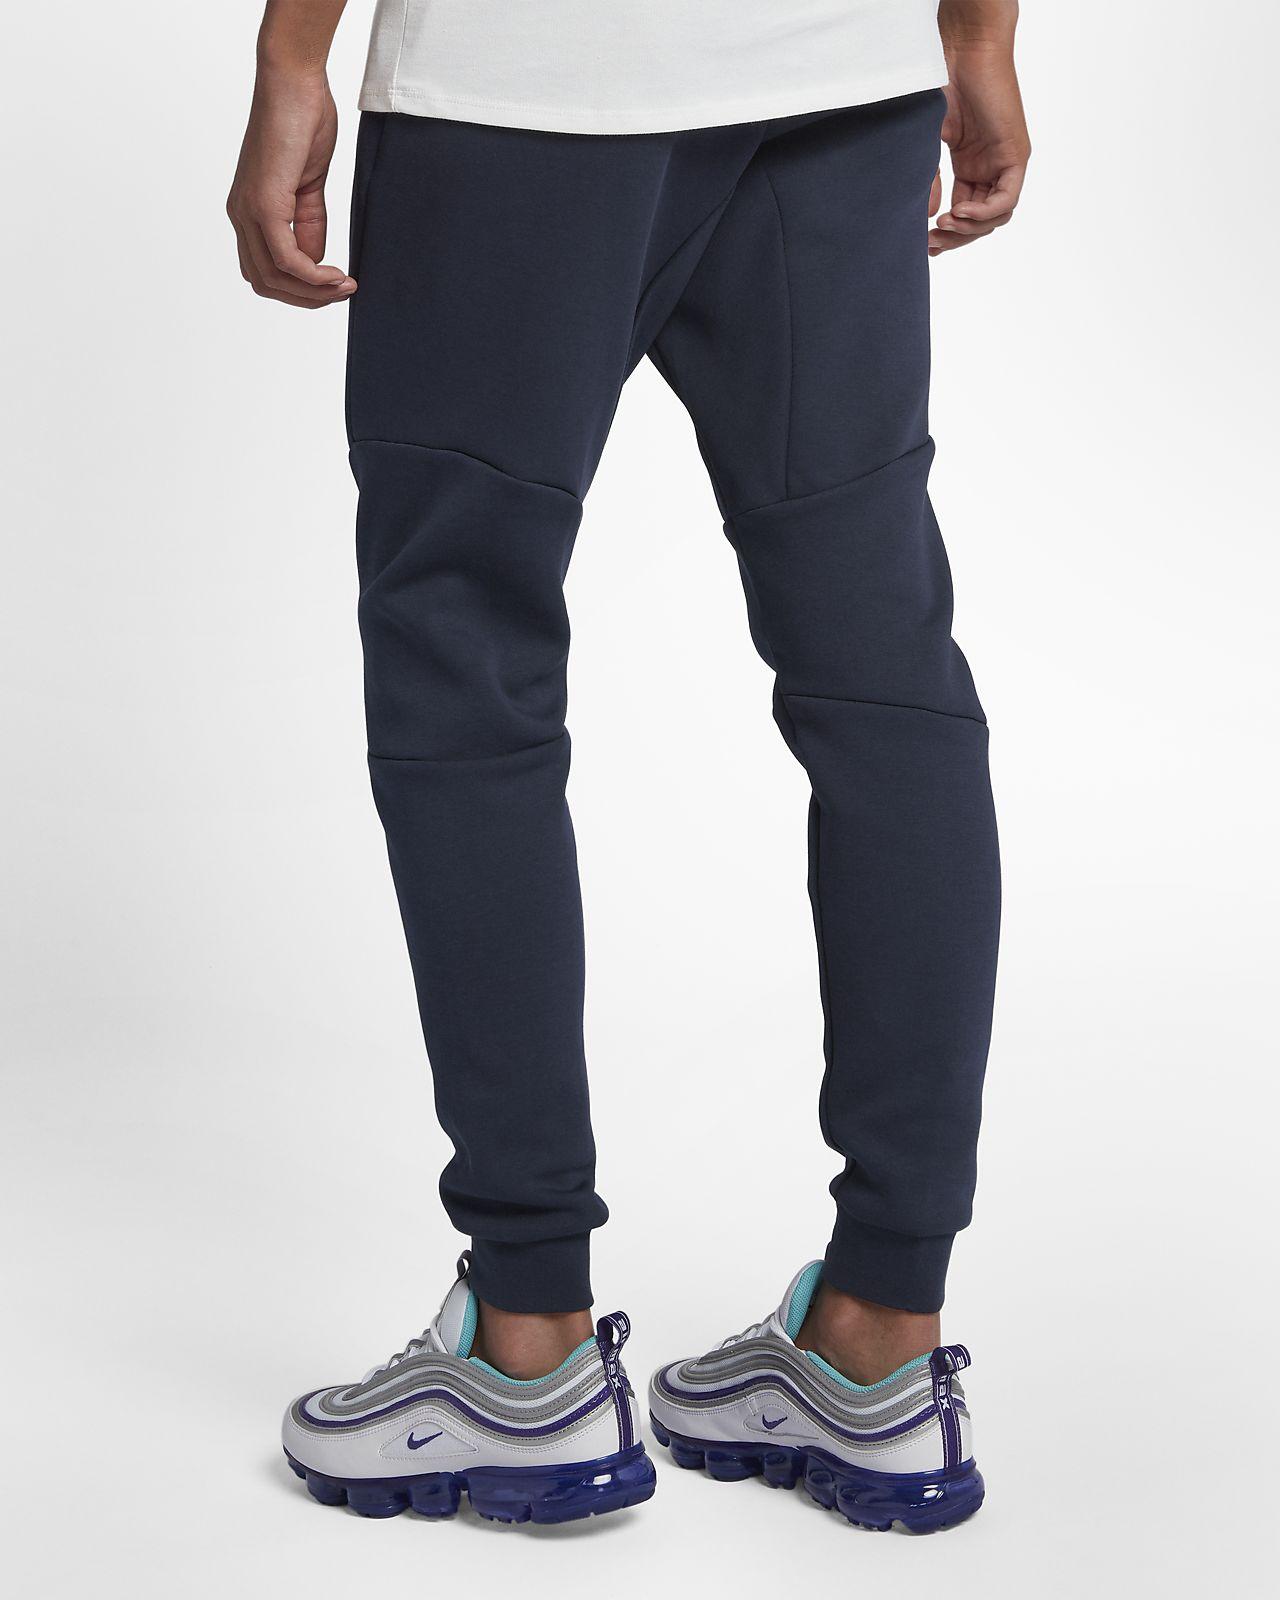 newest 95f99 fc651 ... Pantalon de jogging Nike Sportswear Tech Fleece pour Homme